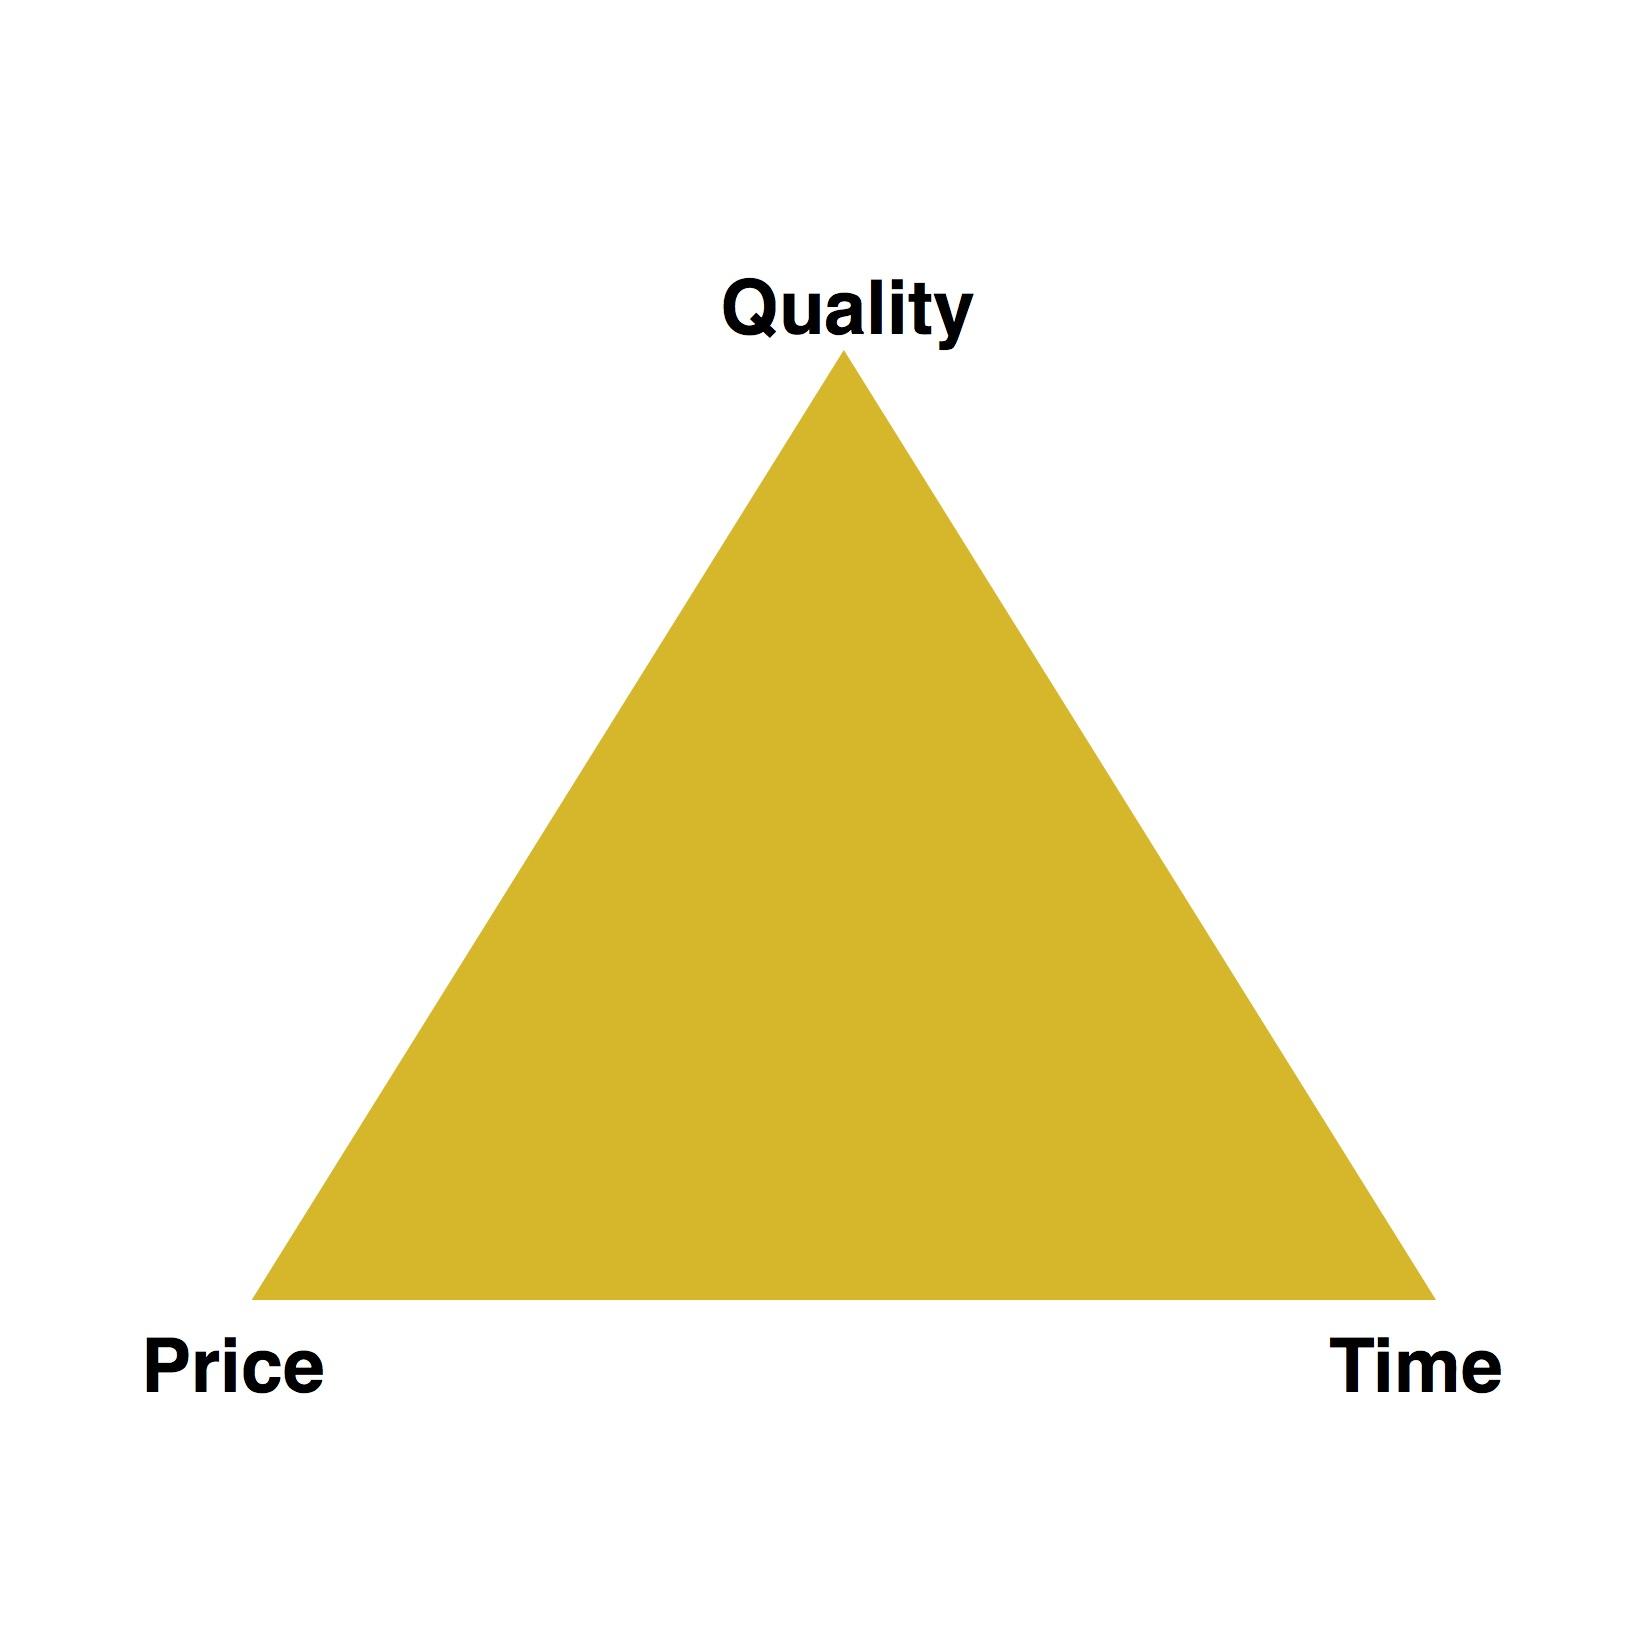 TriangleWhitebgd.jpg